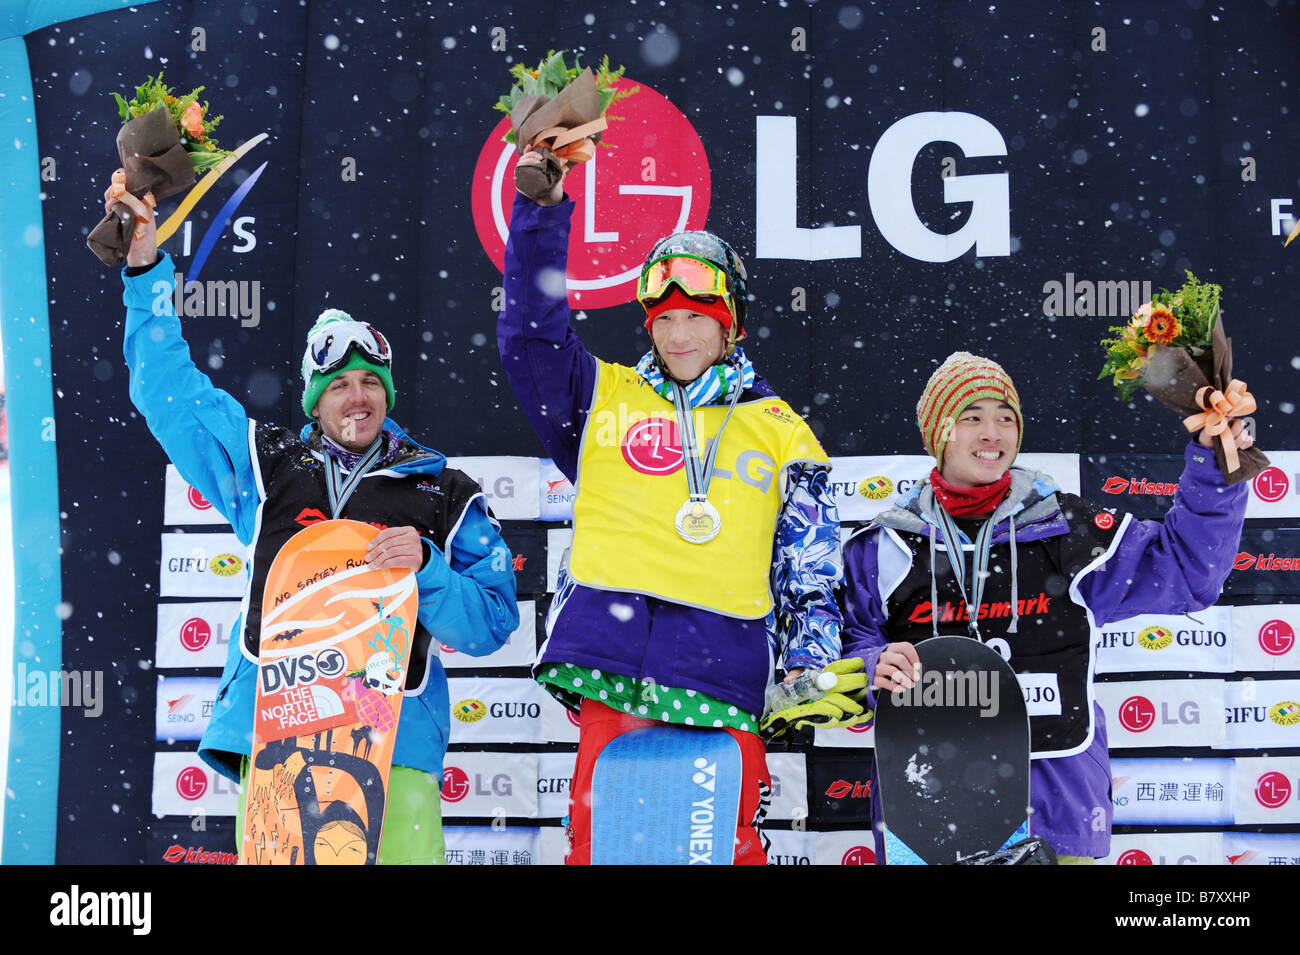 Ryo Aono JPN 14 janvier 2009 Snowboard Ryo Aono C du Japon célèbre 1e place sur le podium avec Ben Mates Photo Stock